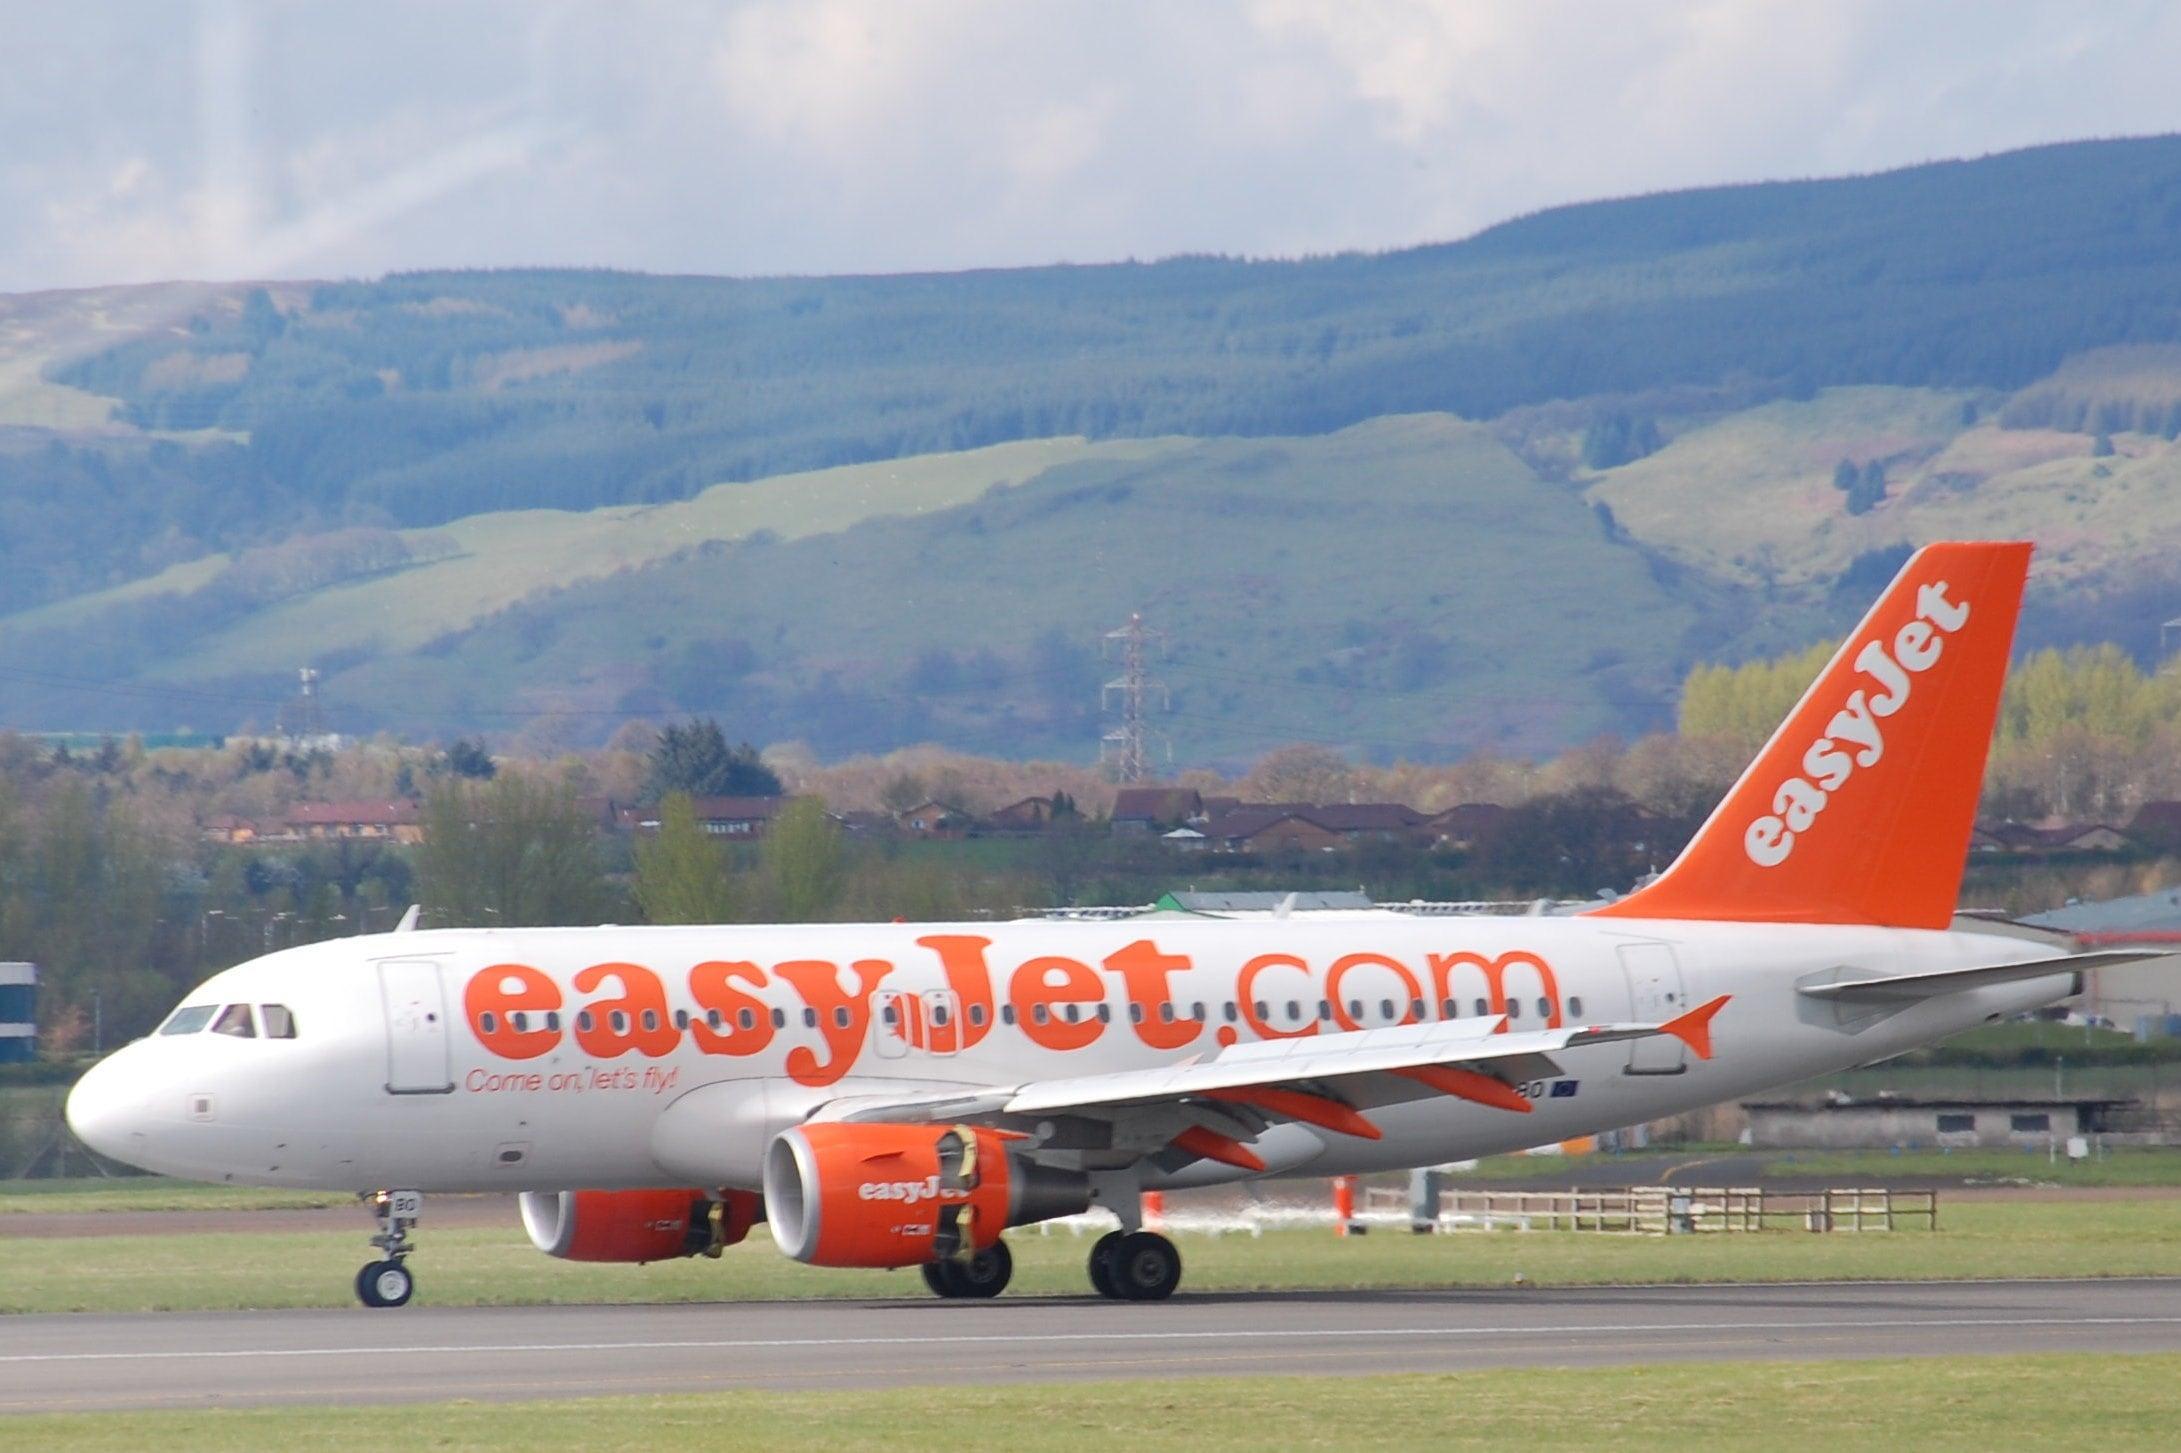 aereo easyjet check in online edreams blog di viaggi